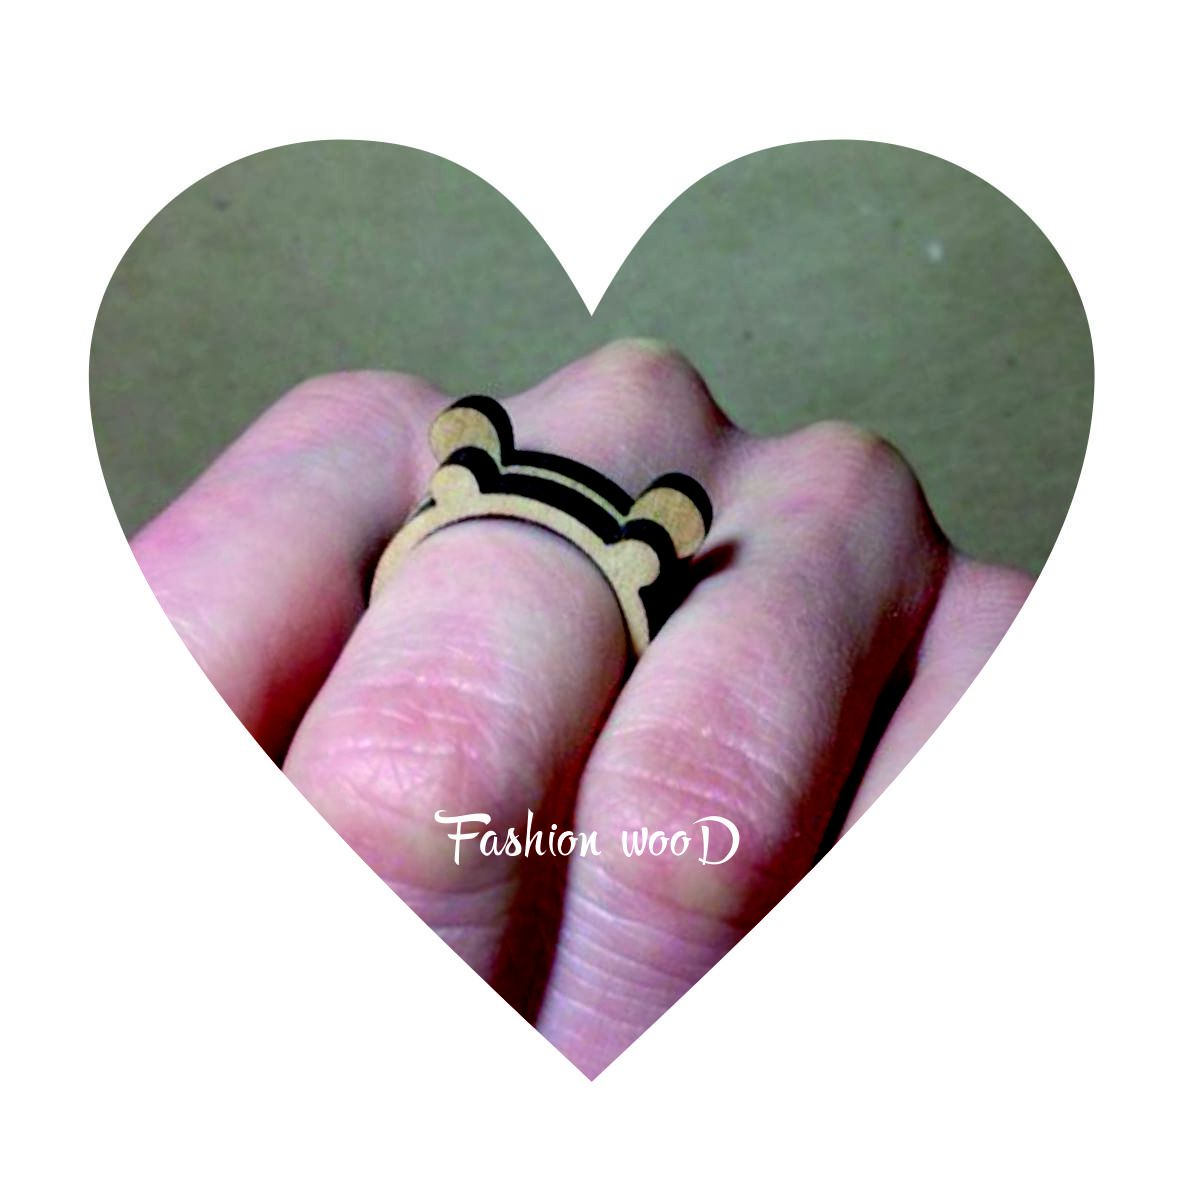 деревянноекольцо сюрприз 14февраля fashionwood кольцо радость подарок